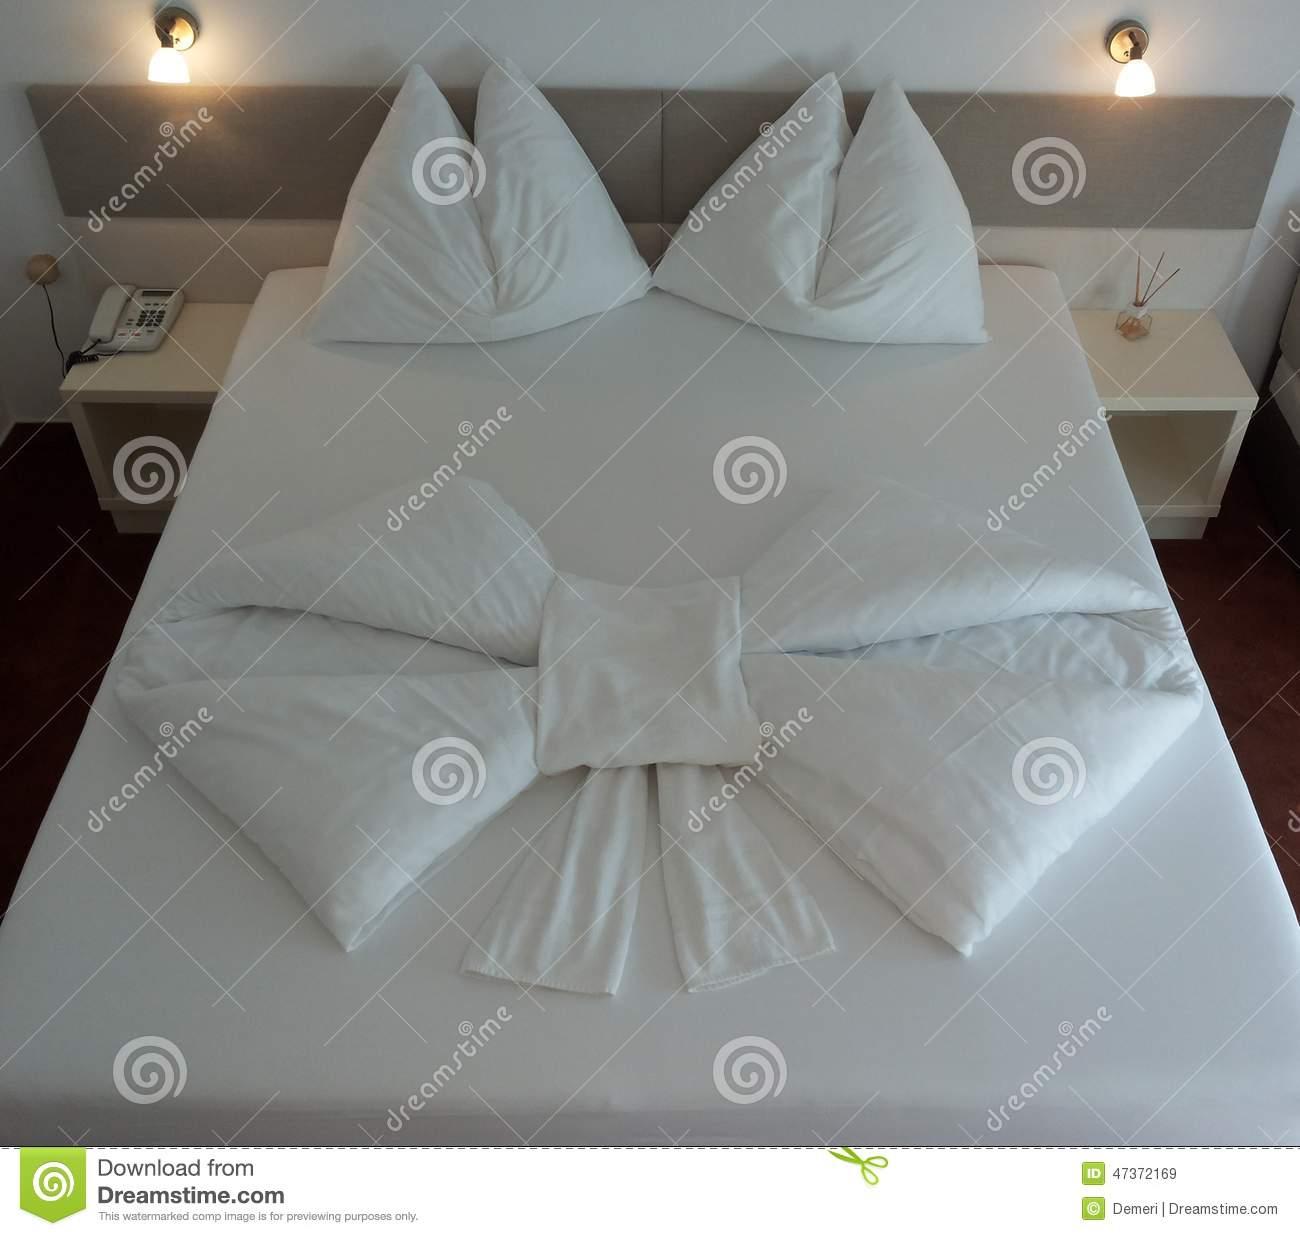 Origami Decoration Bedroom Bed Origami Stock Image Image Of Hotel Luxury Design 47372169